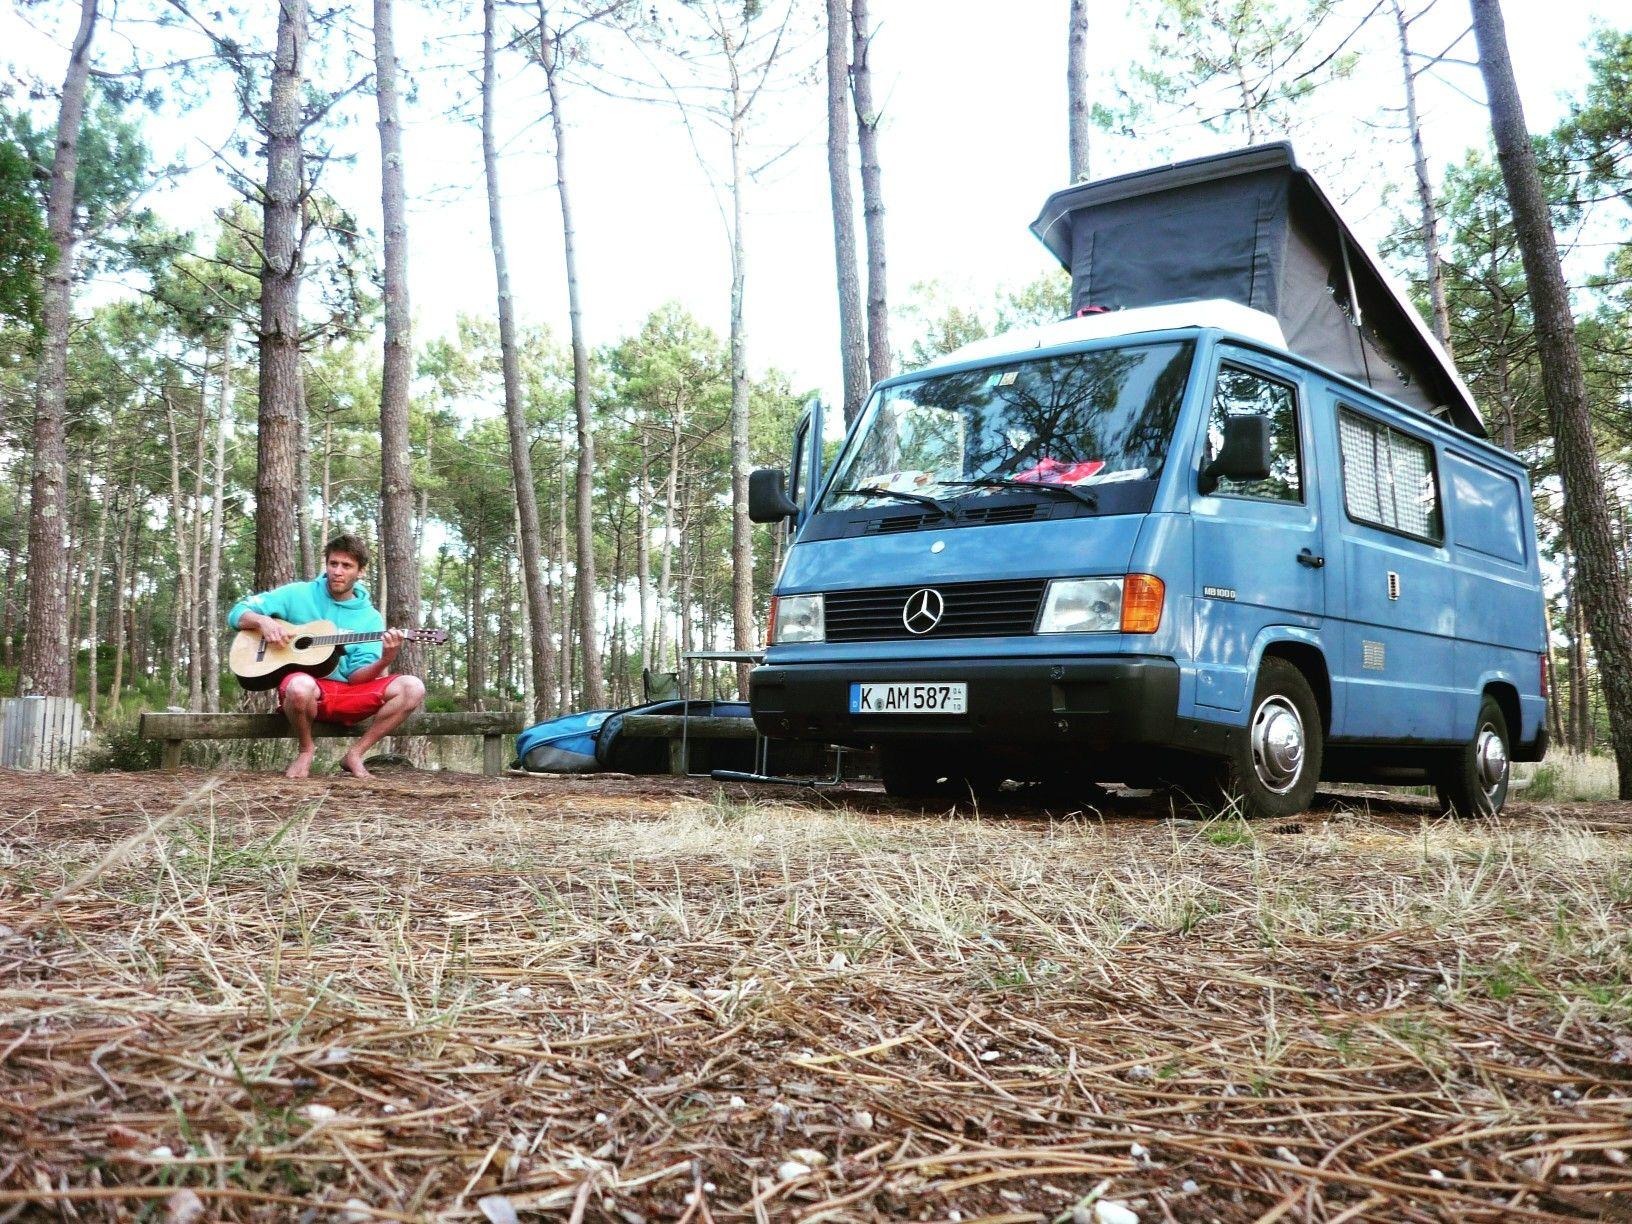 Mb100 enzianblau mercedes cars pinterest mercedes for Mercedes benz camper